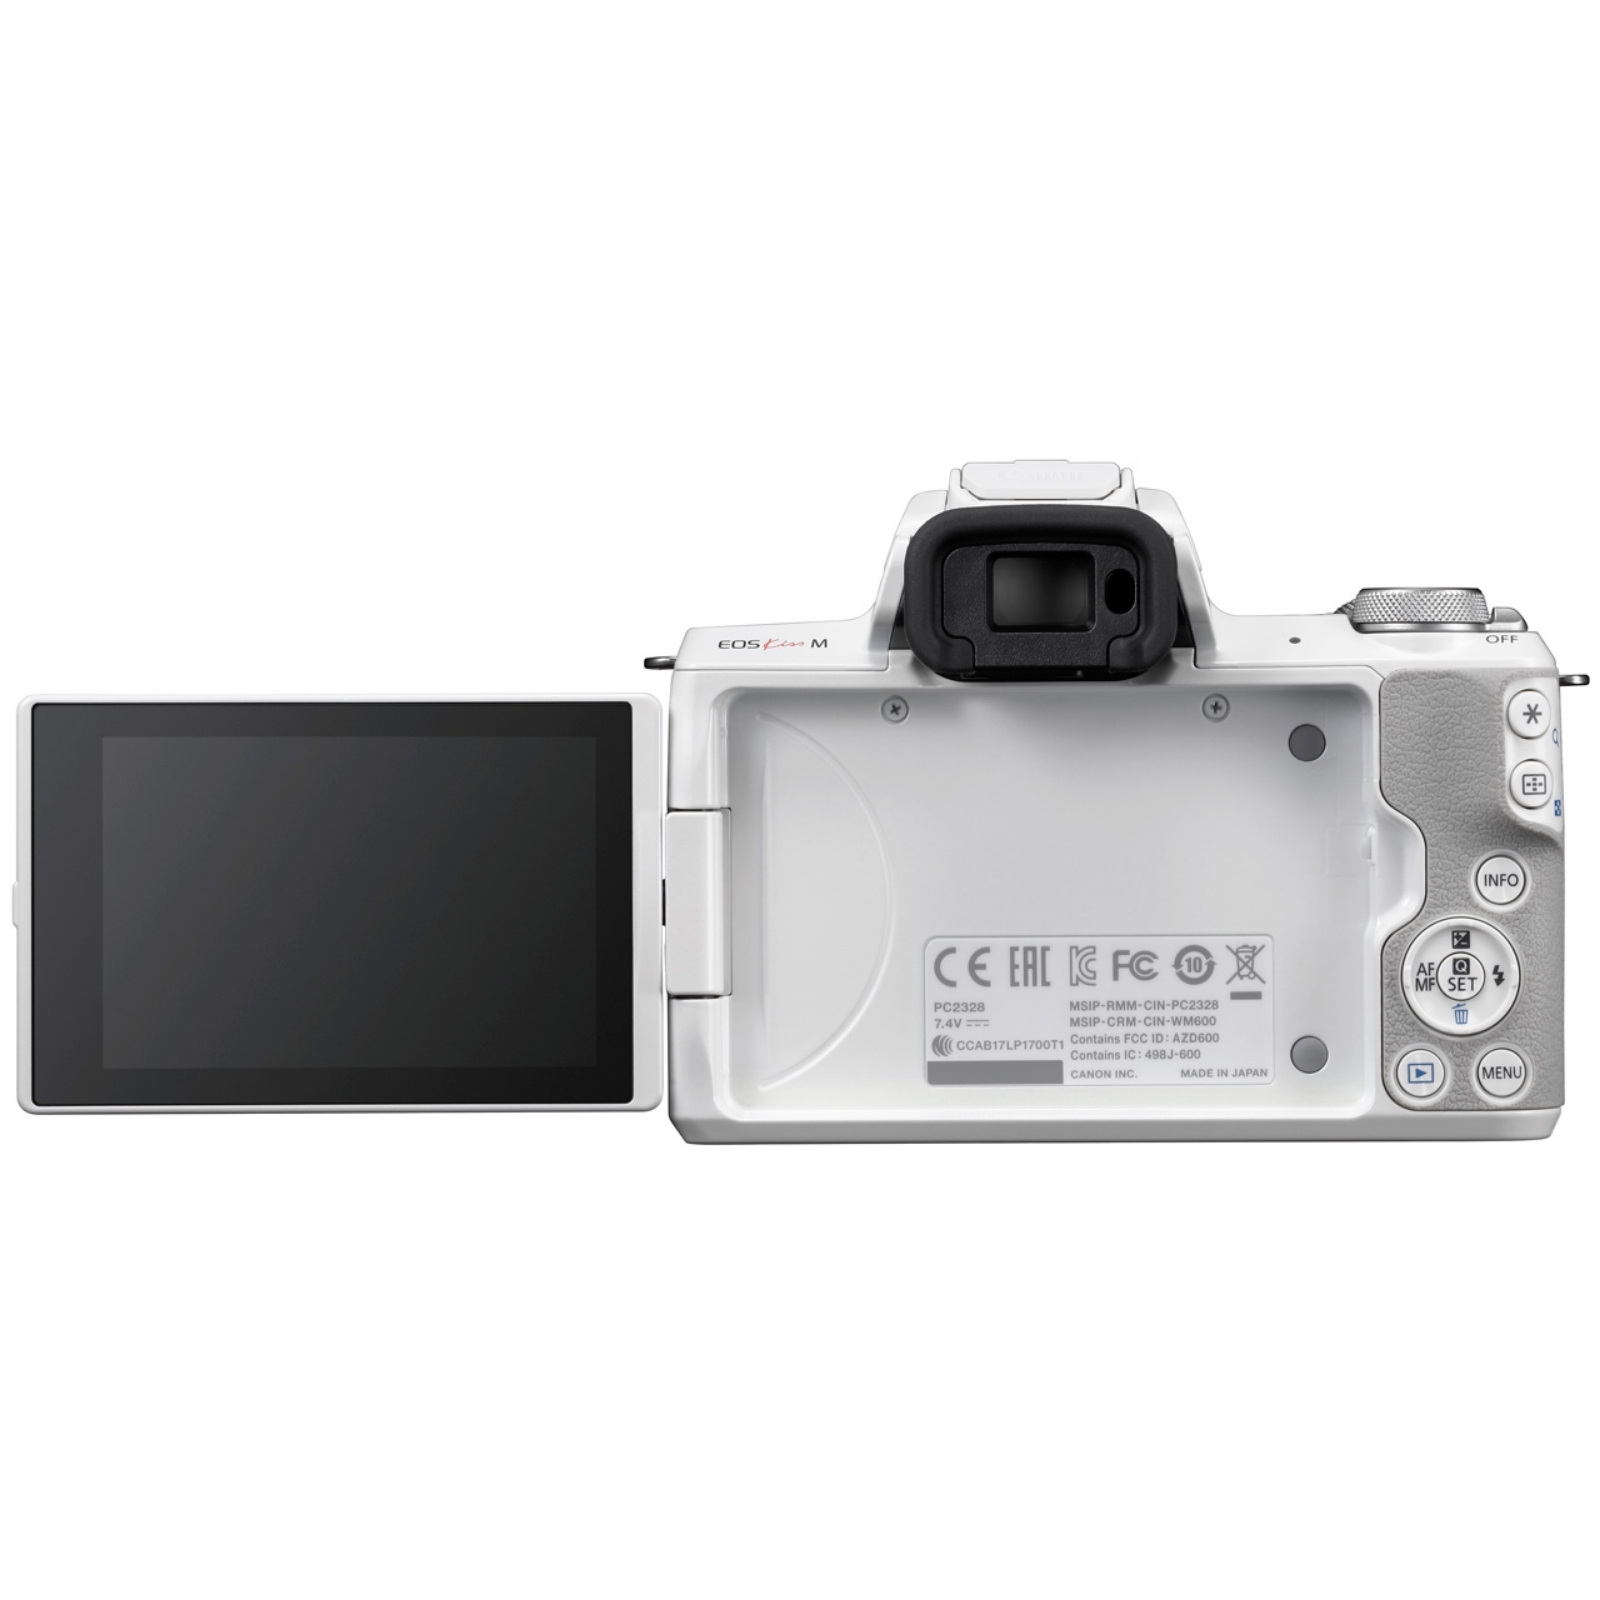 Canon キヤノン ミラーレス一眼カメラ EOS Kiss M ボディ ホワイト 新品